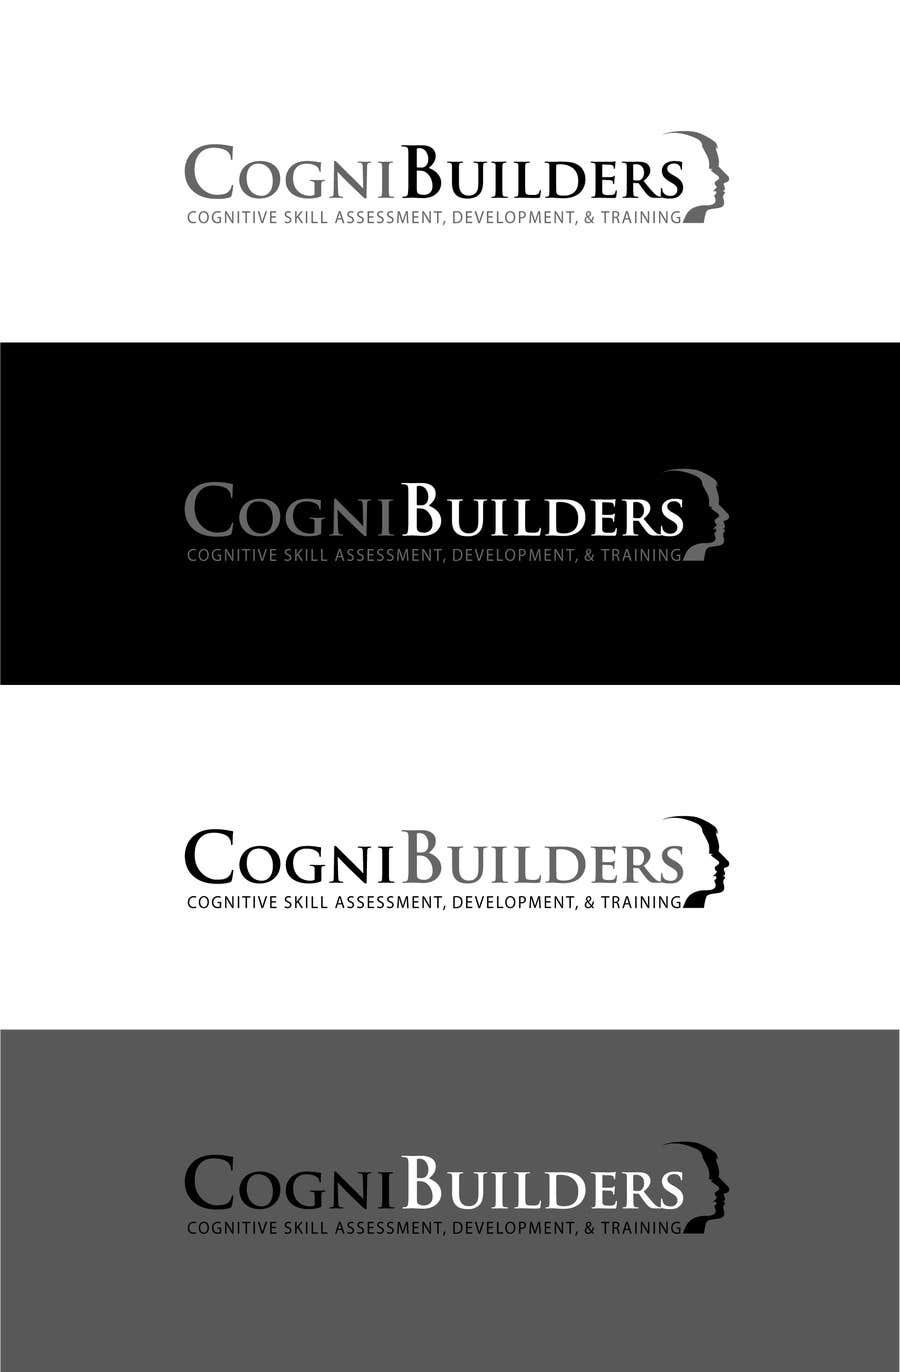 Contest Entry #82 for Design a Logo for Cognibuilders